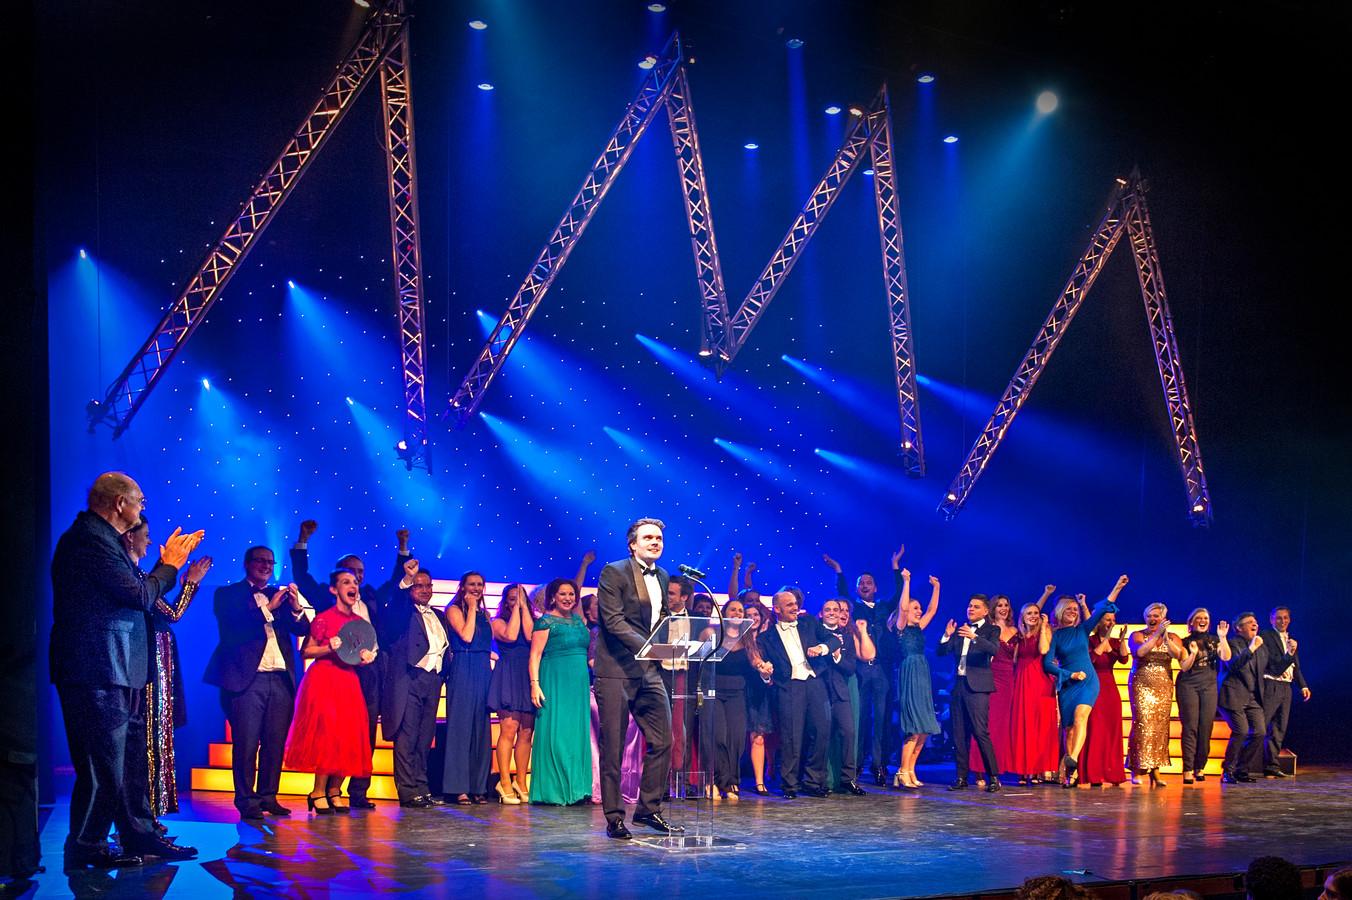 Archieffoto. BOV uit Bergen op Zoom won in december 2018 drie musical awards.